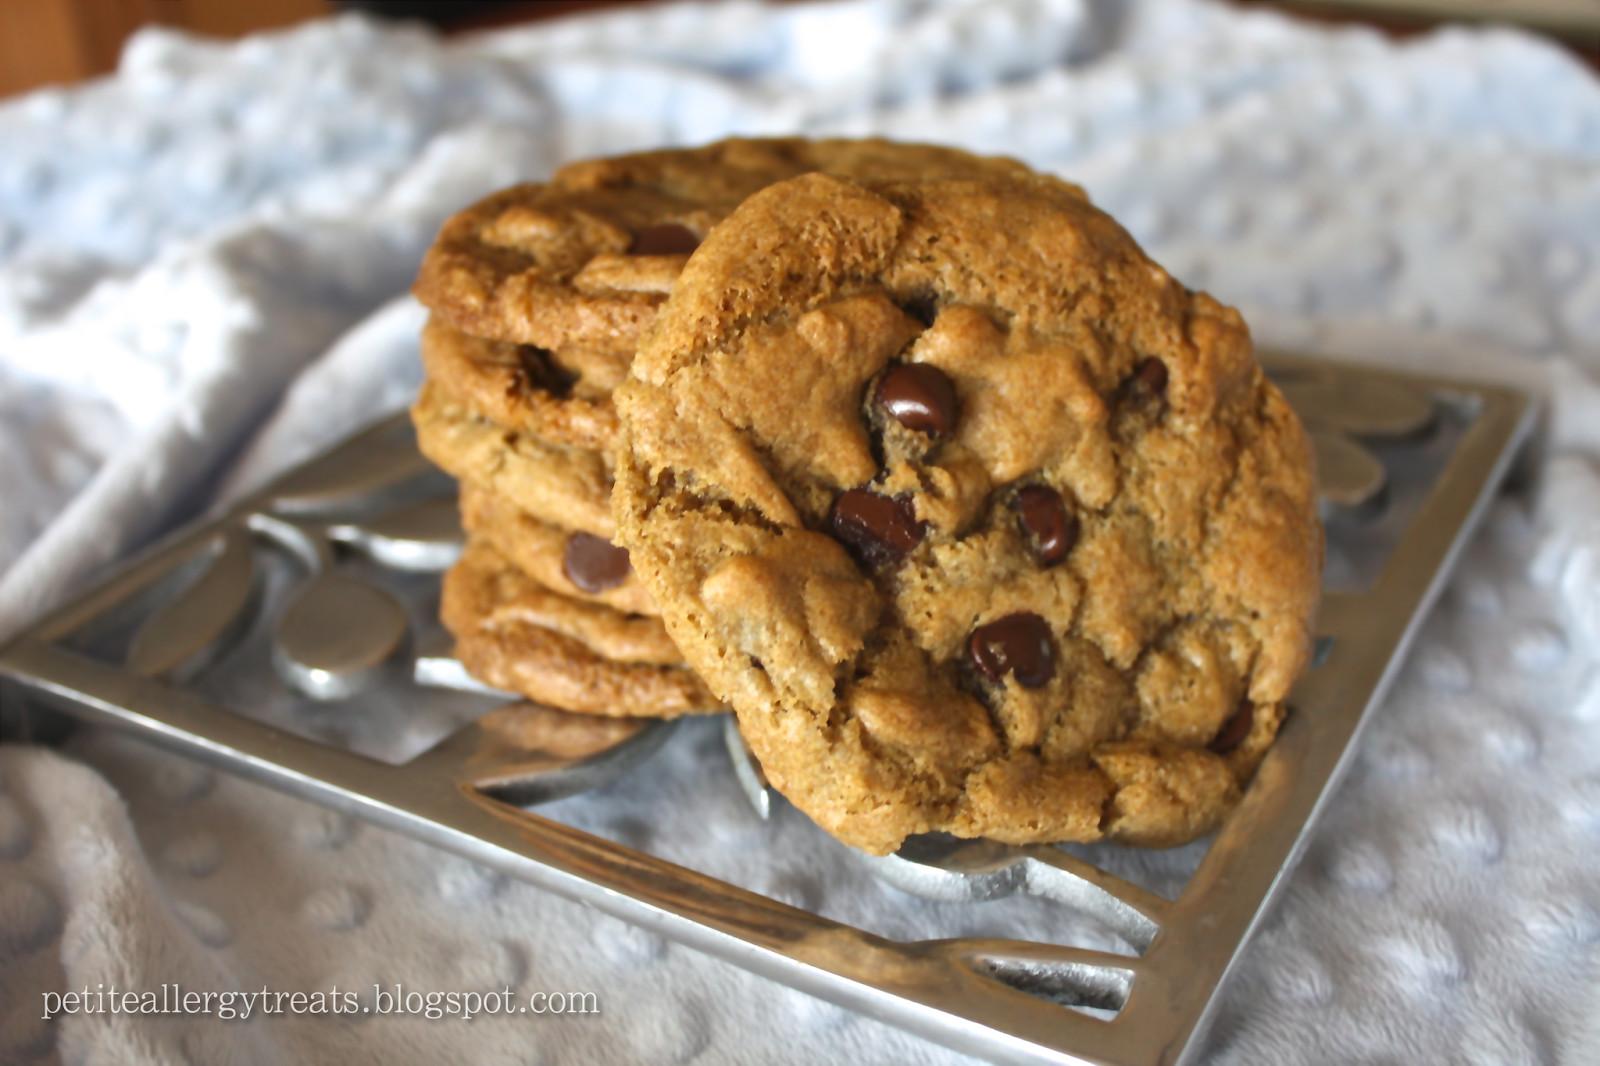 Vegan Gluten Free Chocolate Chip Cookies  Gluten Free Vegan Chocolate chip cookies Petite Allergy